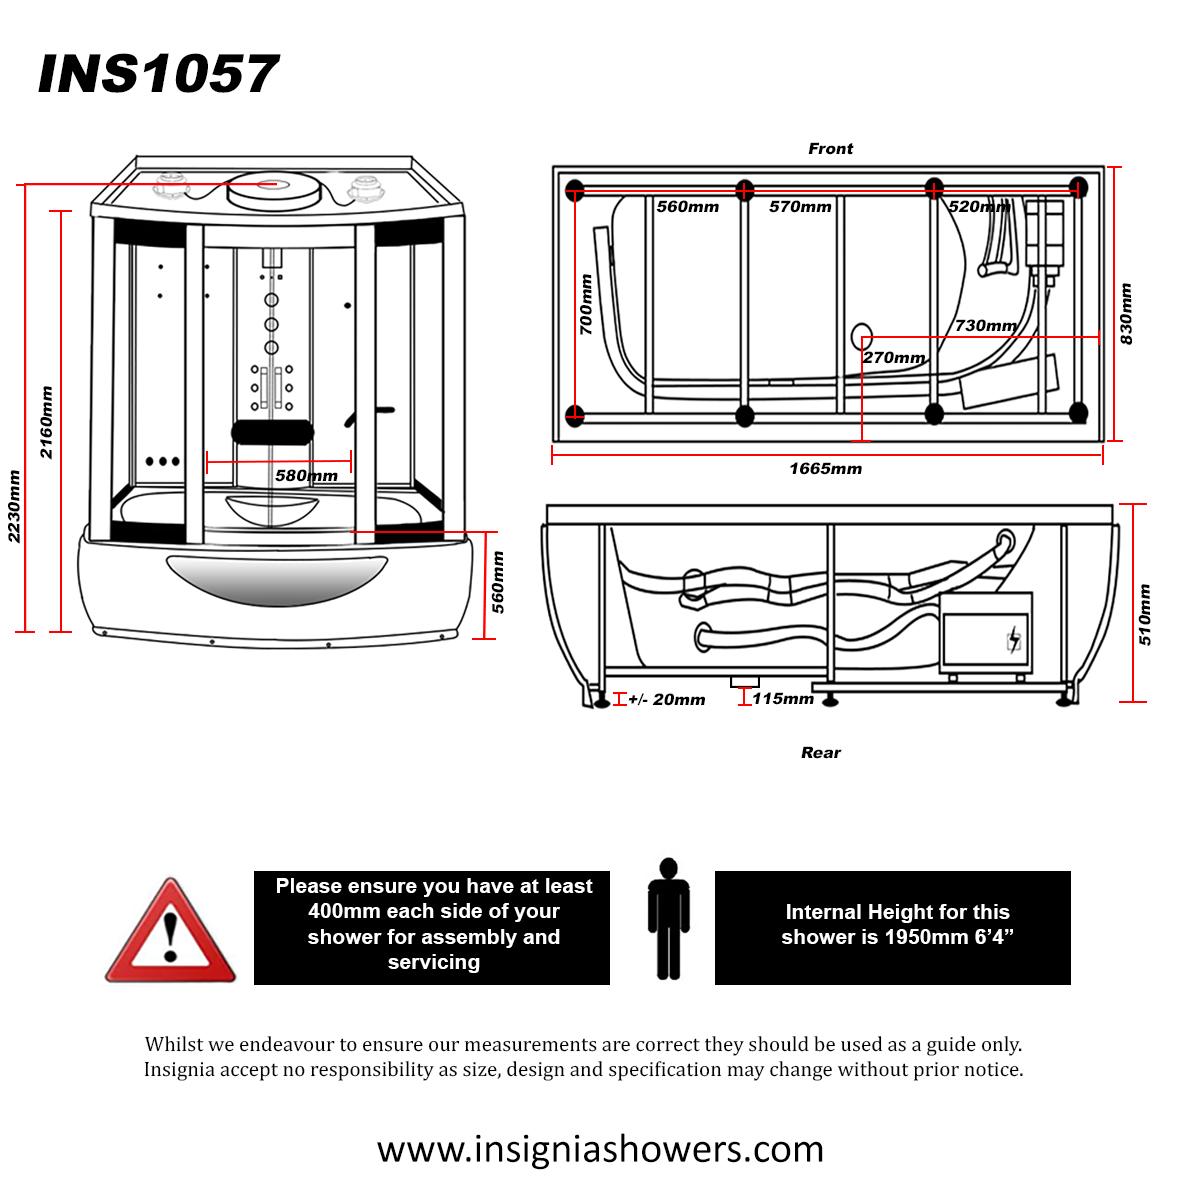 INS1057